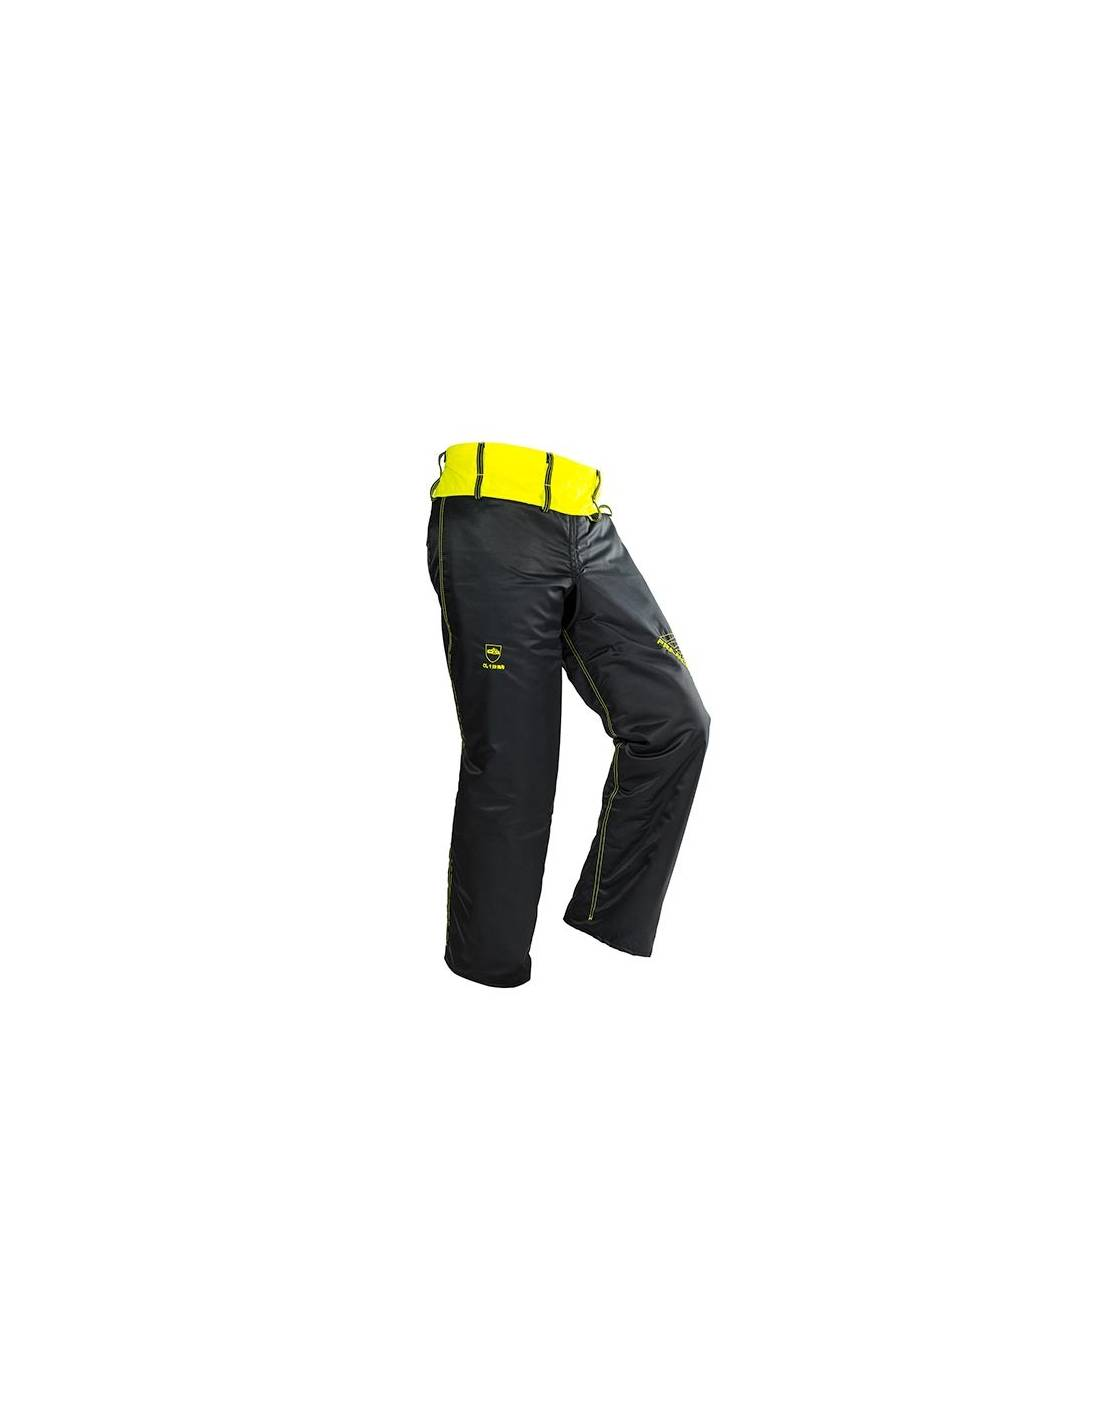 5e41b3d4234 PERNERA FORESTAL PROTECCIÓN MOTOSIERRA CLASE 1 FI003B | Epi tienda